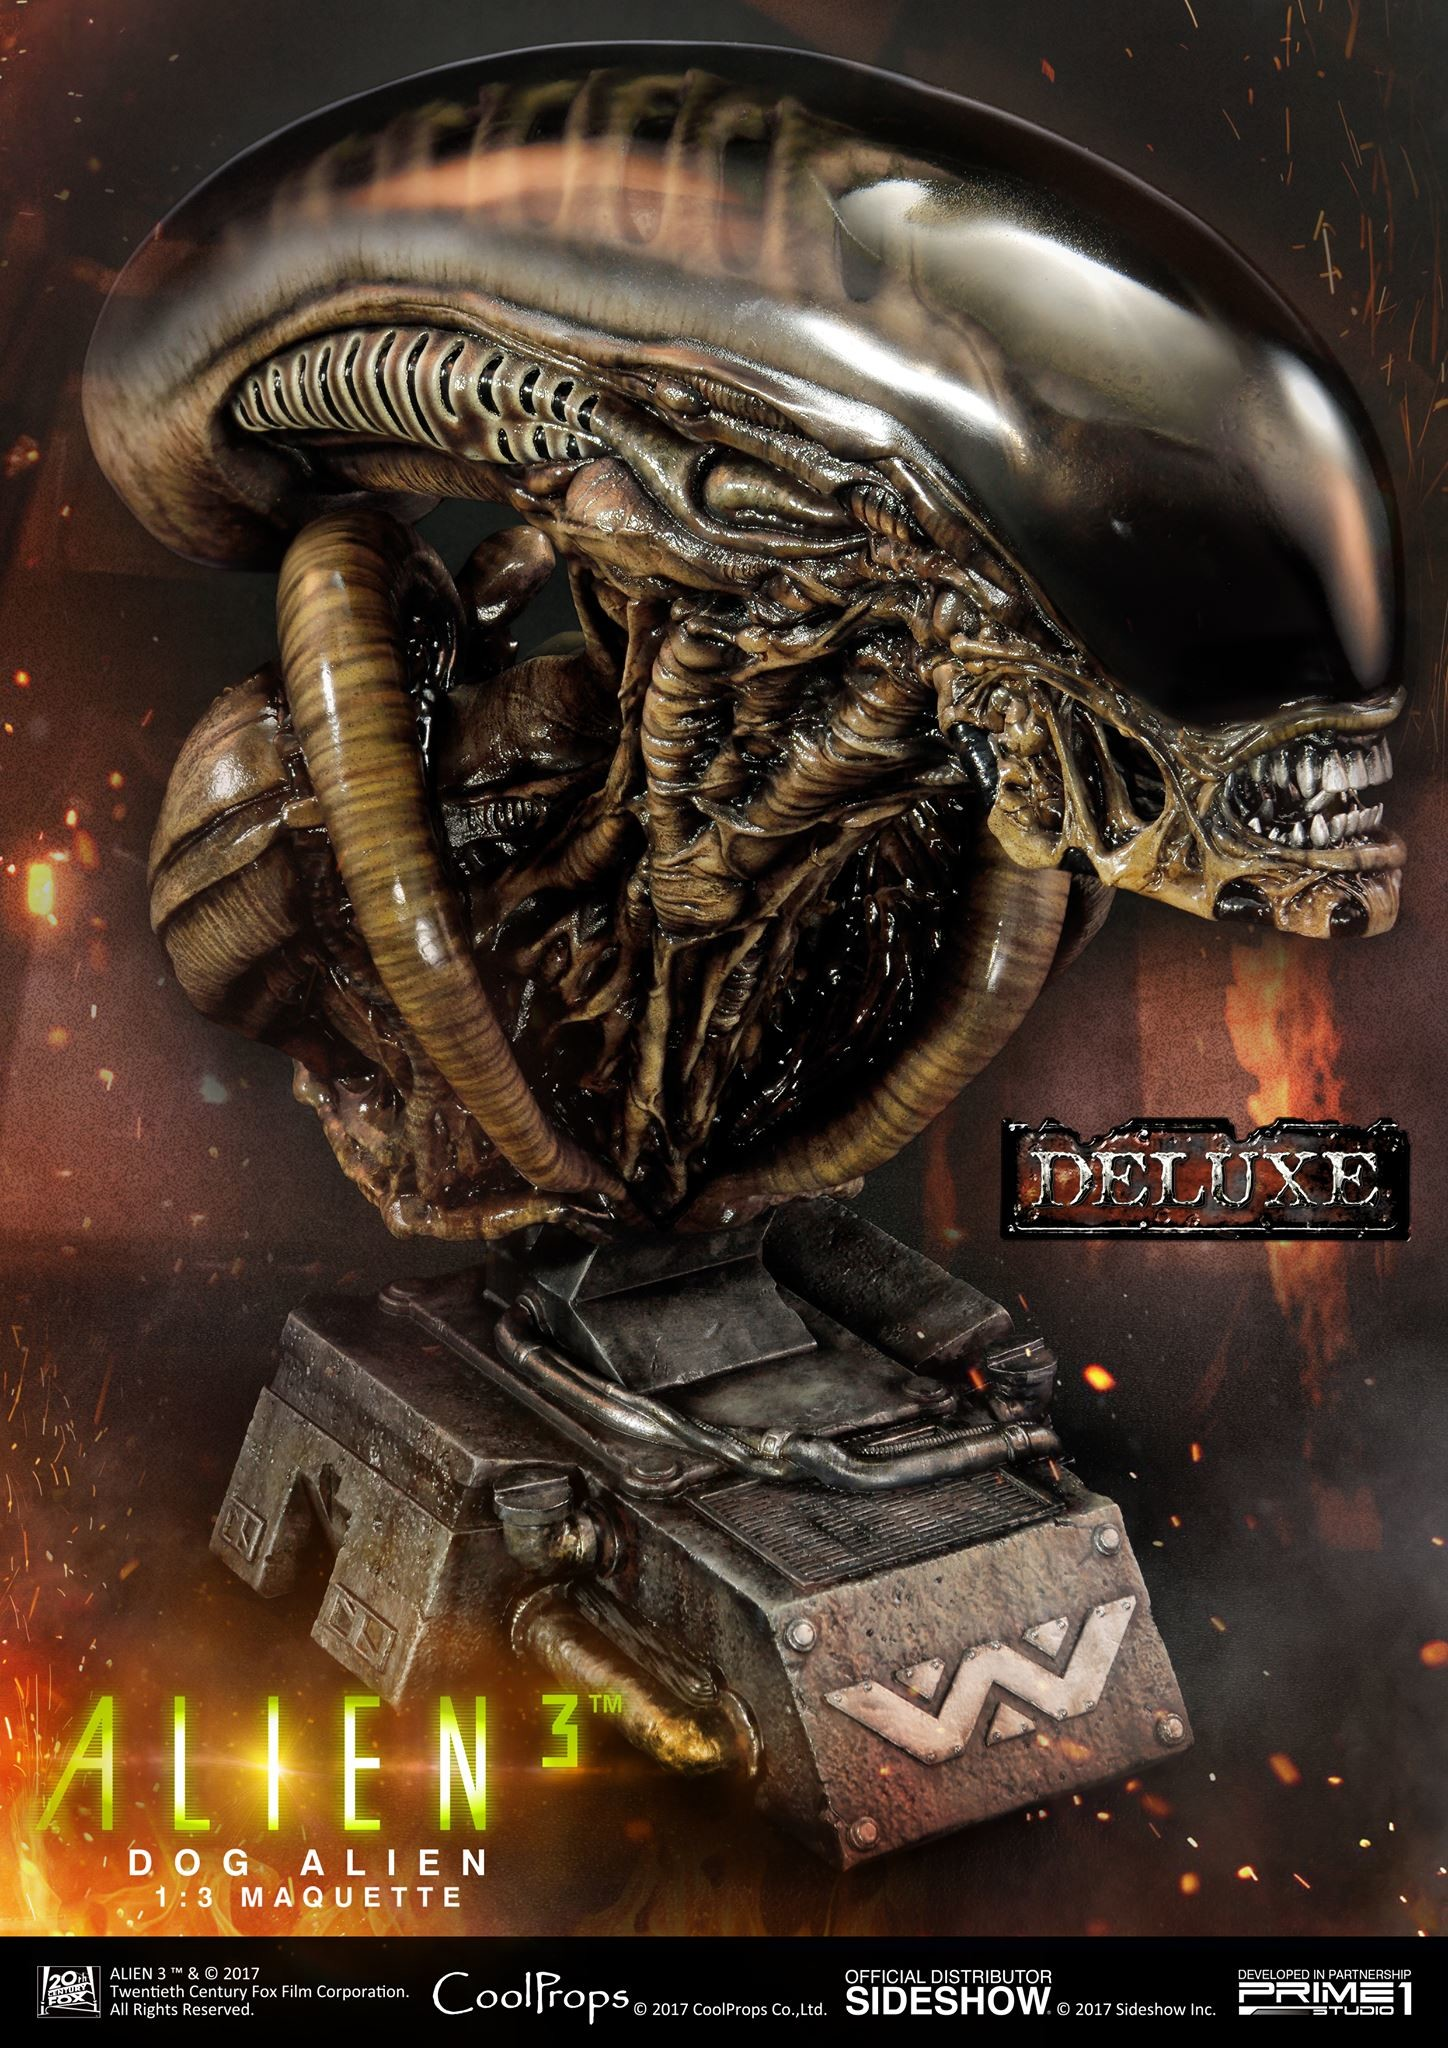 Abner marin alien 3 dog alien maquette 007